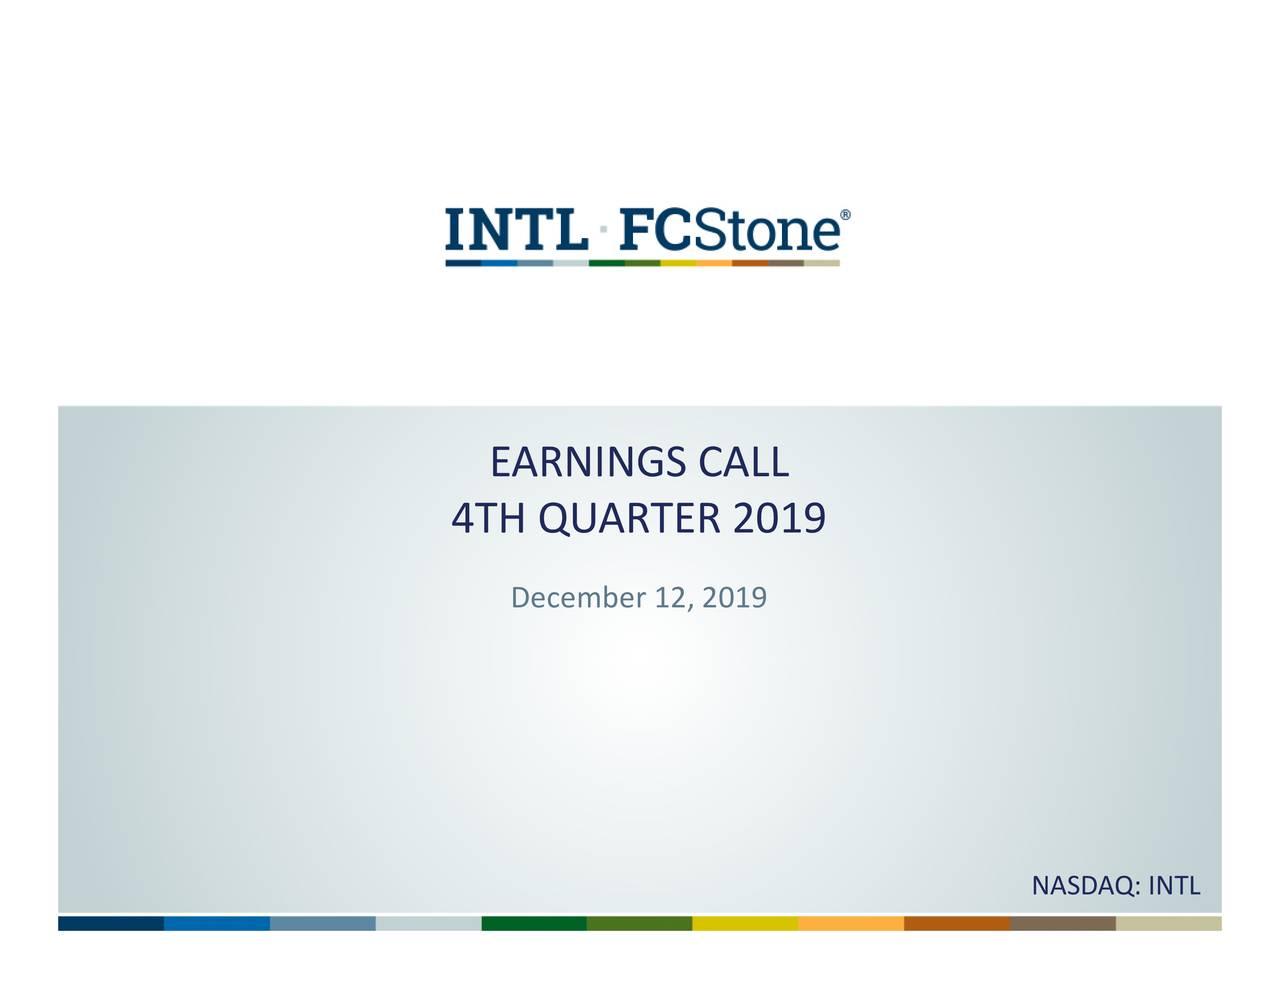 INTL FCStone Inc. 2019 Q4 - Results - Earnings Call Presentation - INTL FCStone Inc. (NASDAQ:INTL) | Seeking Alpha